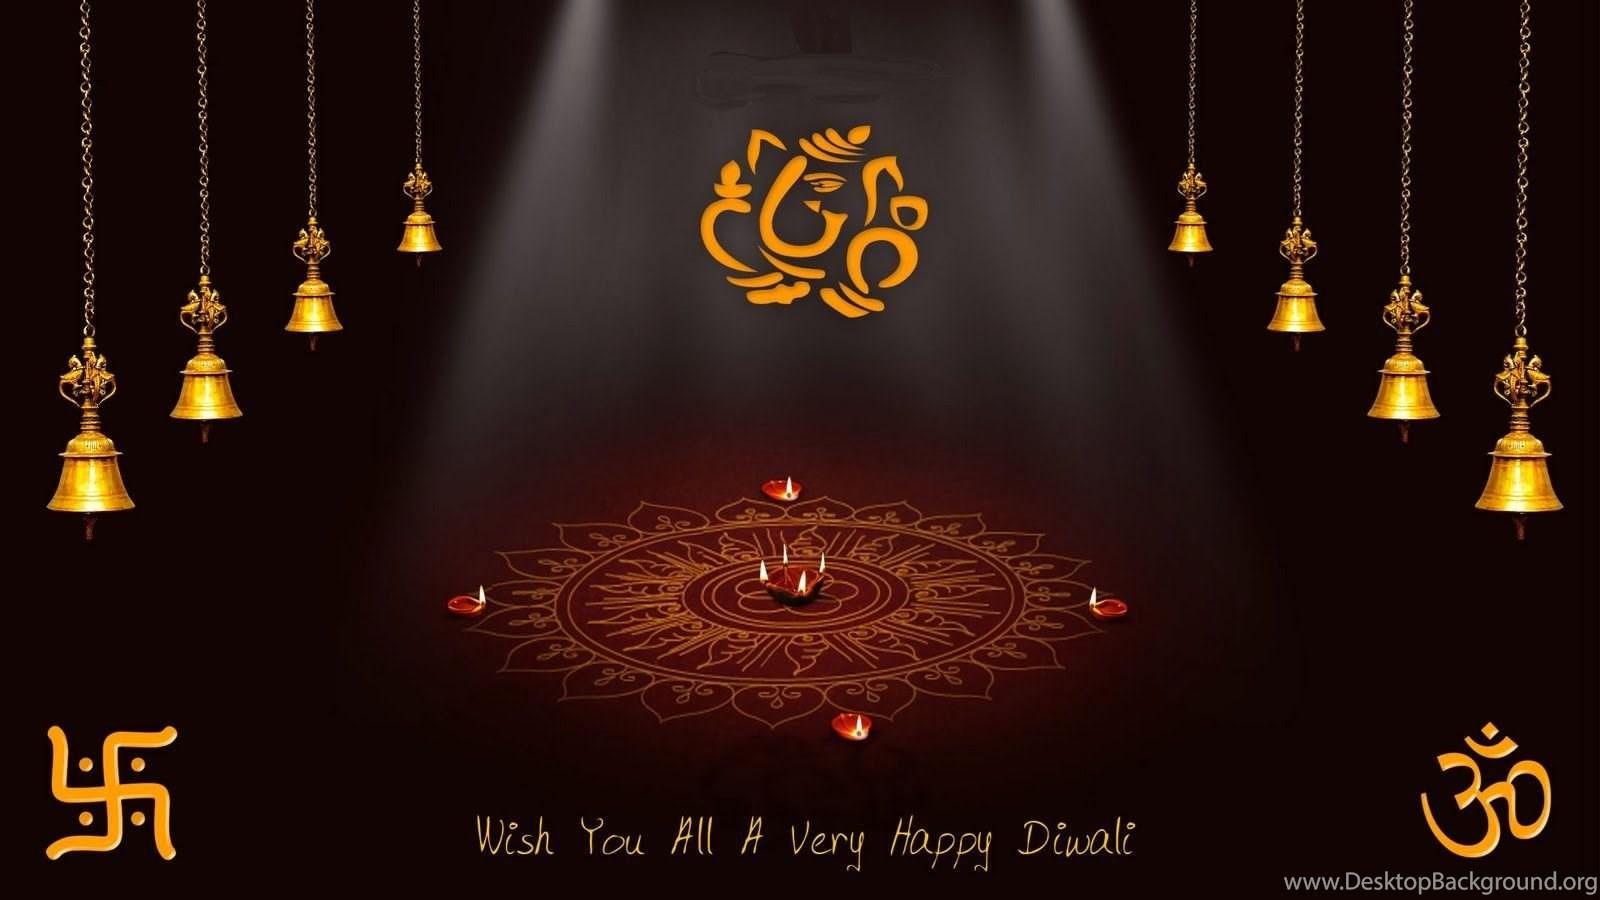 Happy Diwali And New Year Wallpapers: Happy Diwali 2013 HD Wallpaper, Lord Ganesh, Lakshmi Mata